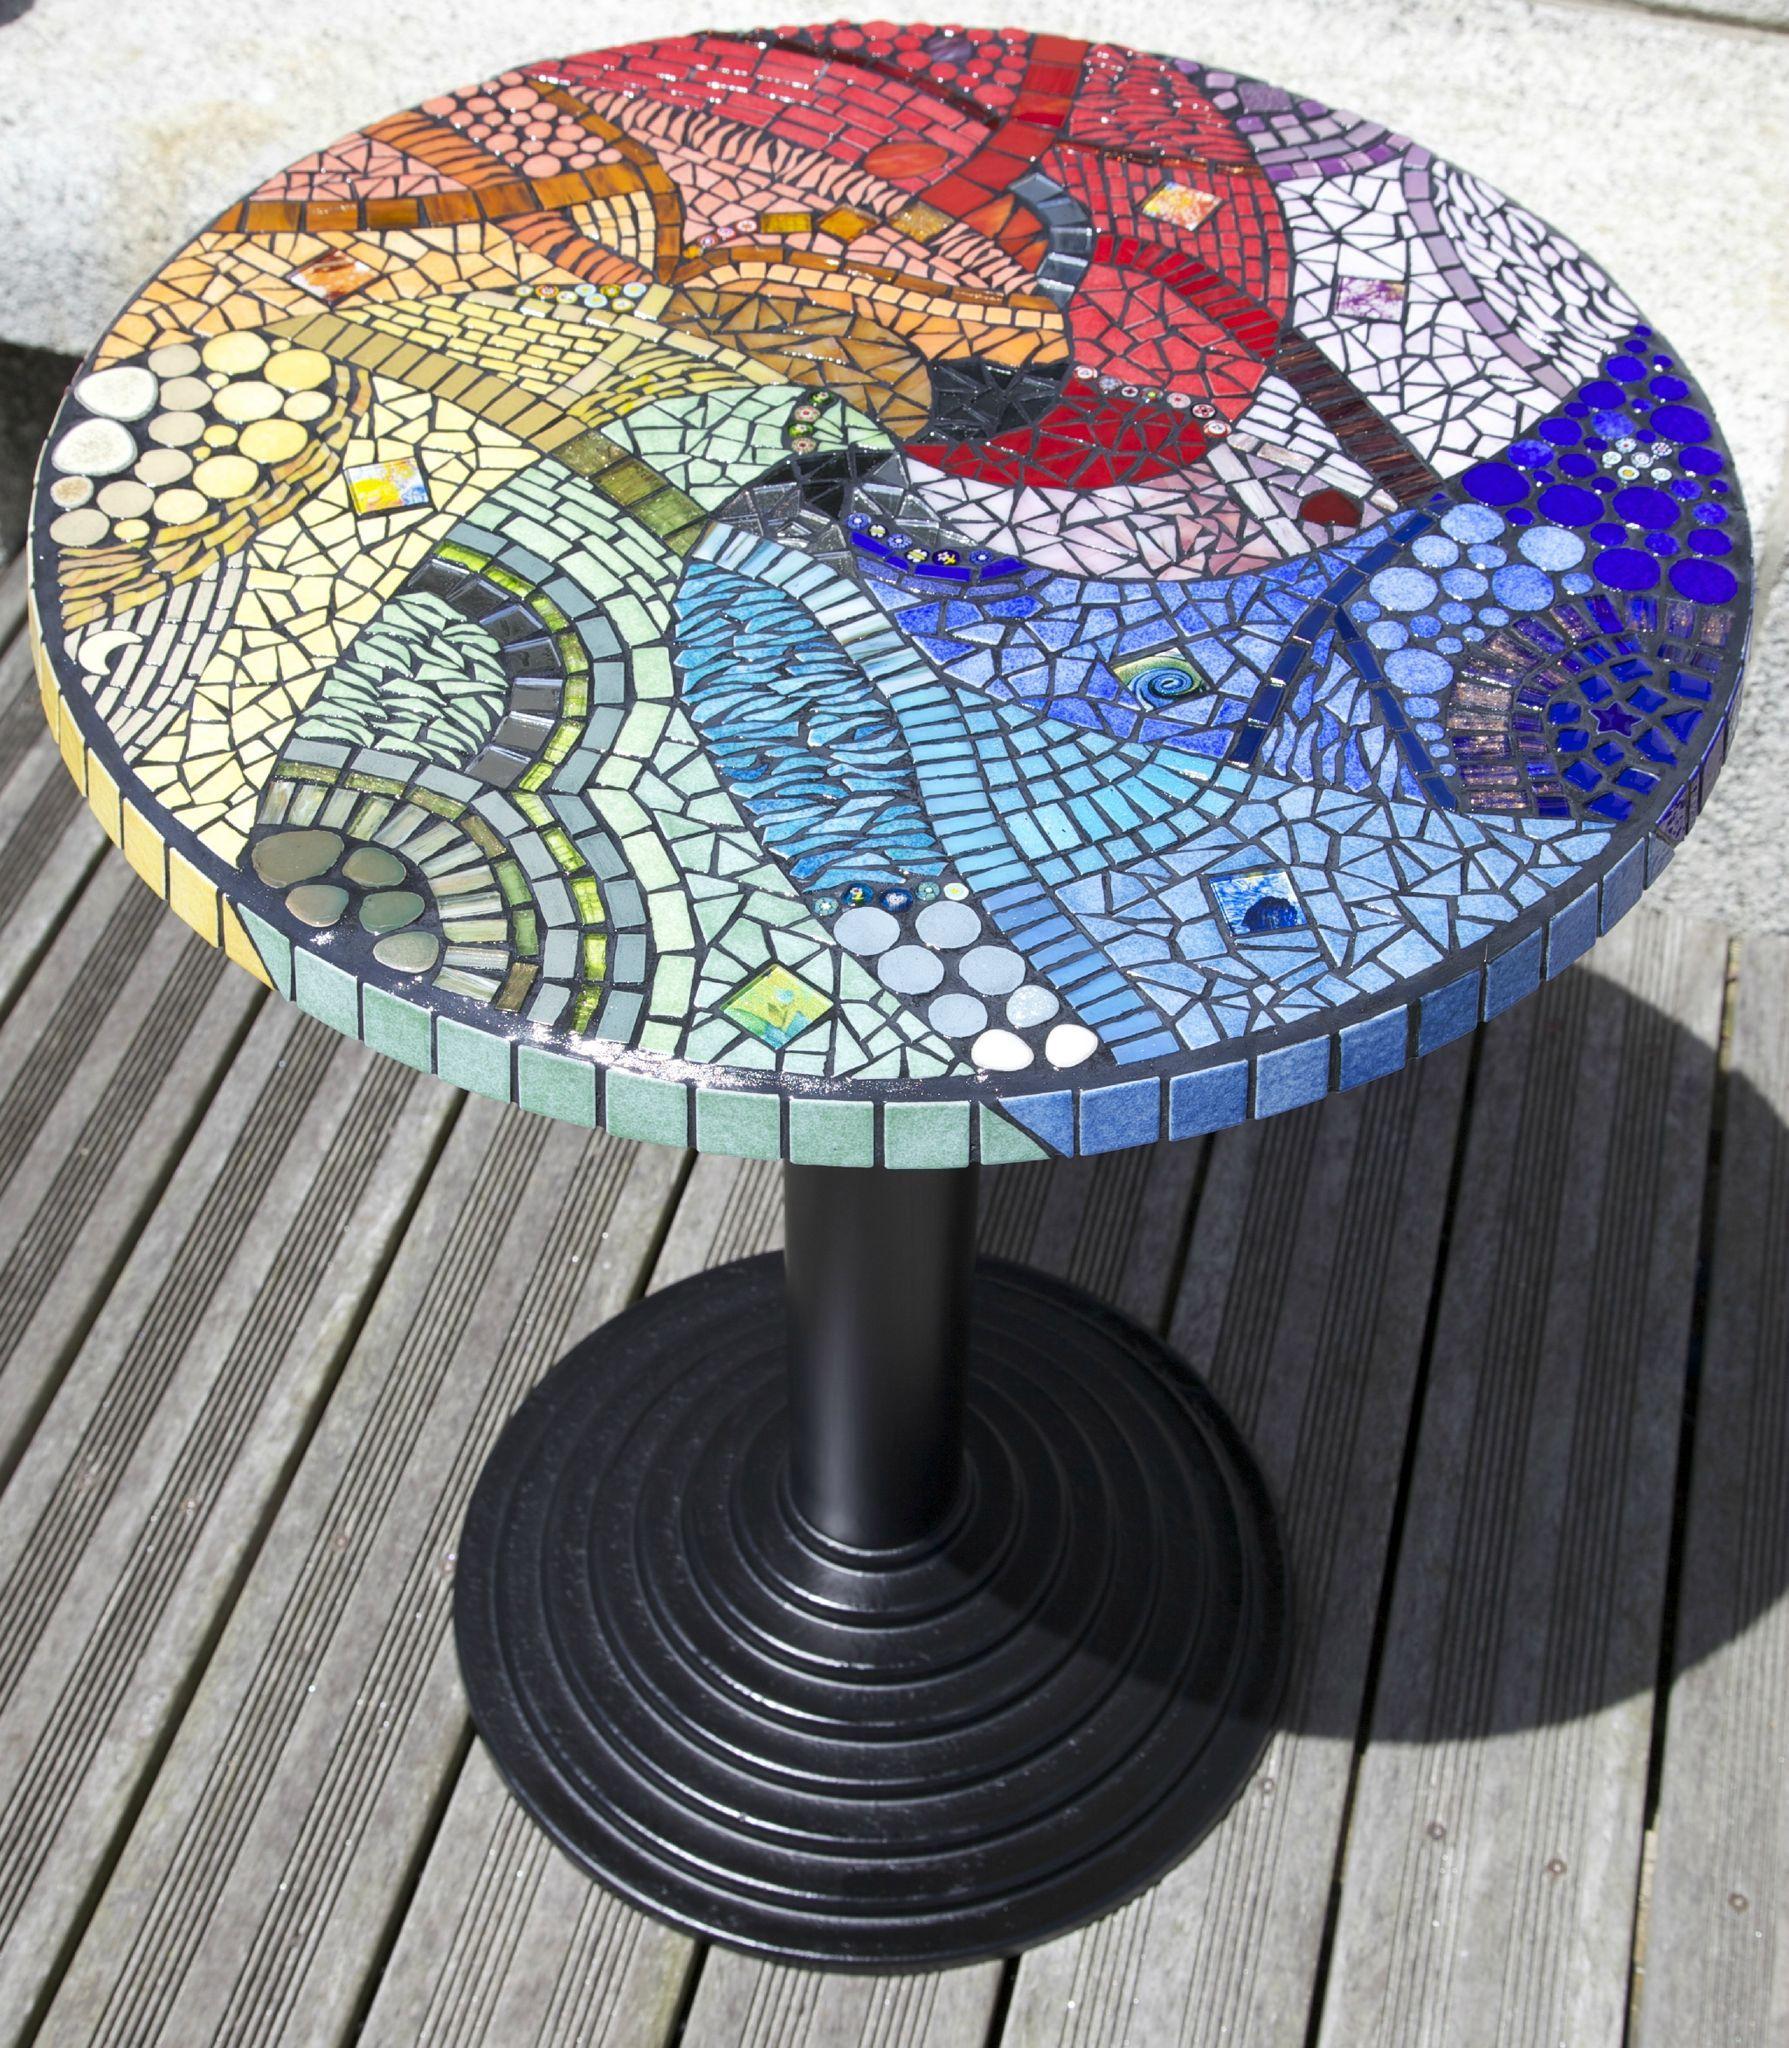 Table Ronde Mosaique | Table Mosaique, Mosaique Et Carrelage ... serapportantà Table De Jardin En Carrelage